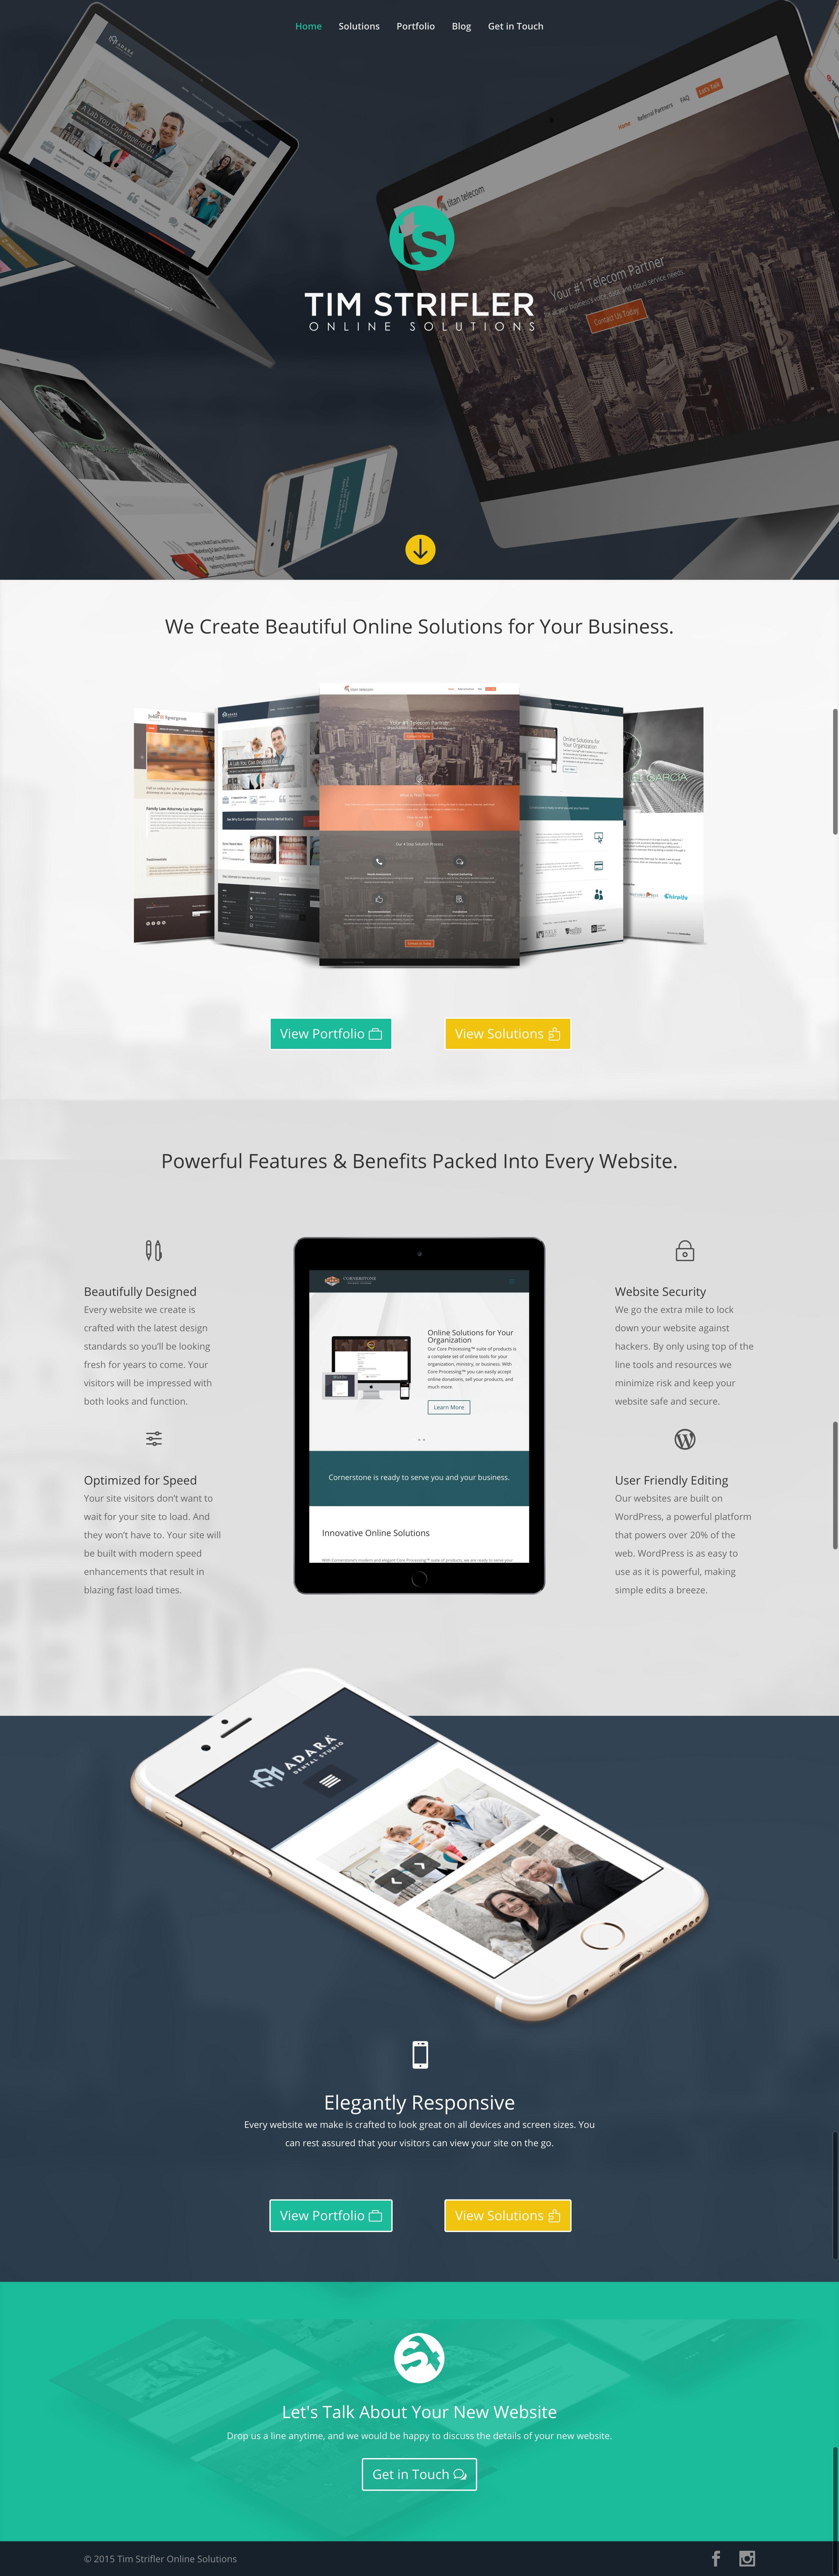 Tim Strifler Website Design Design Development Divi Wordpress Themes